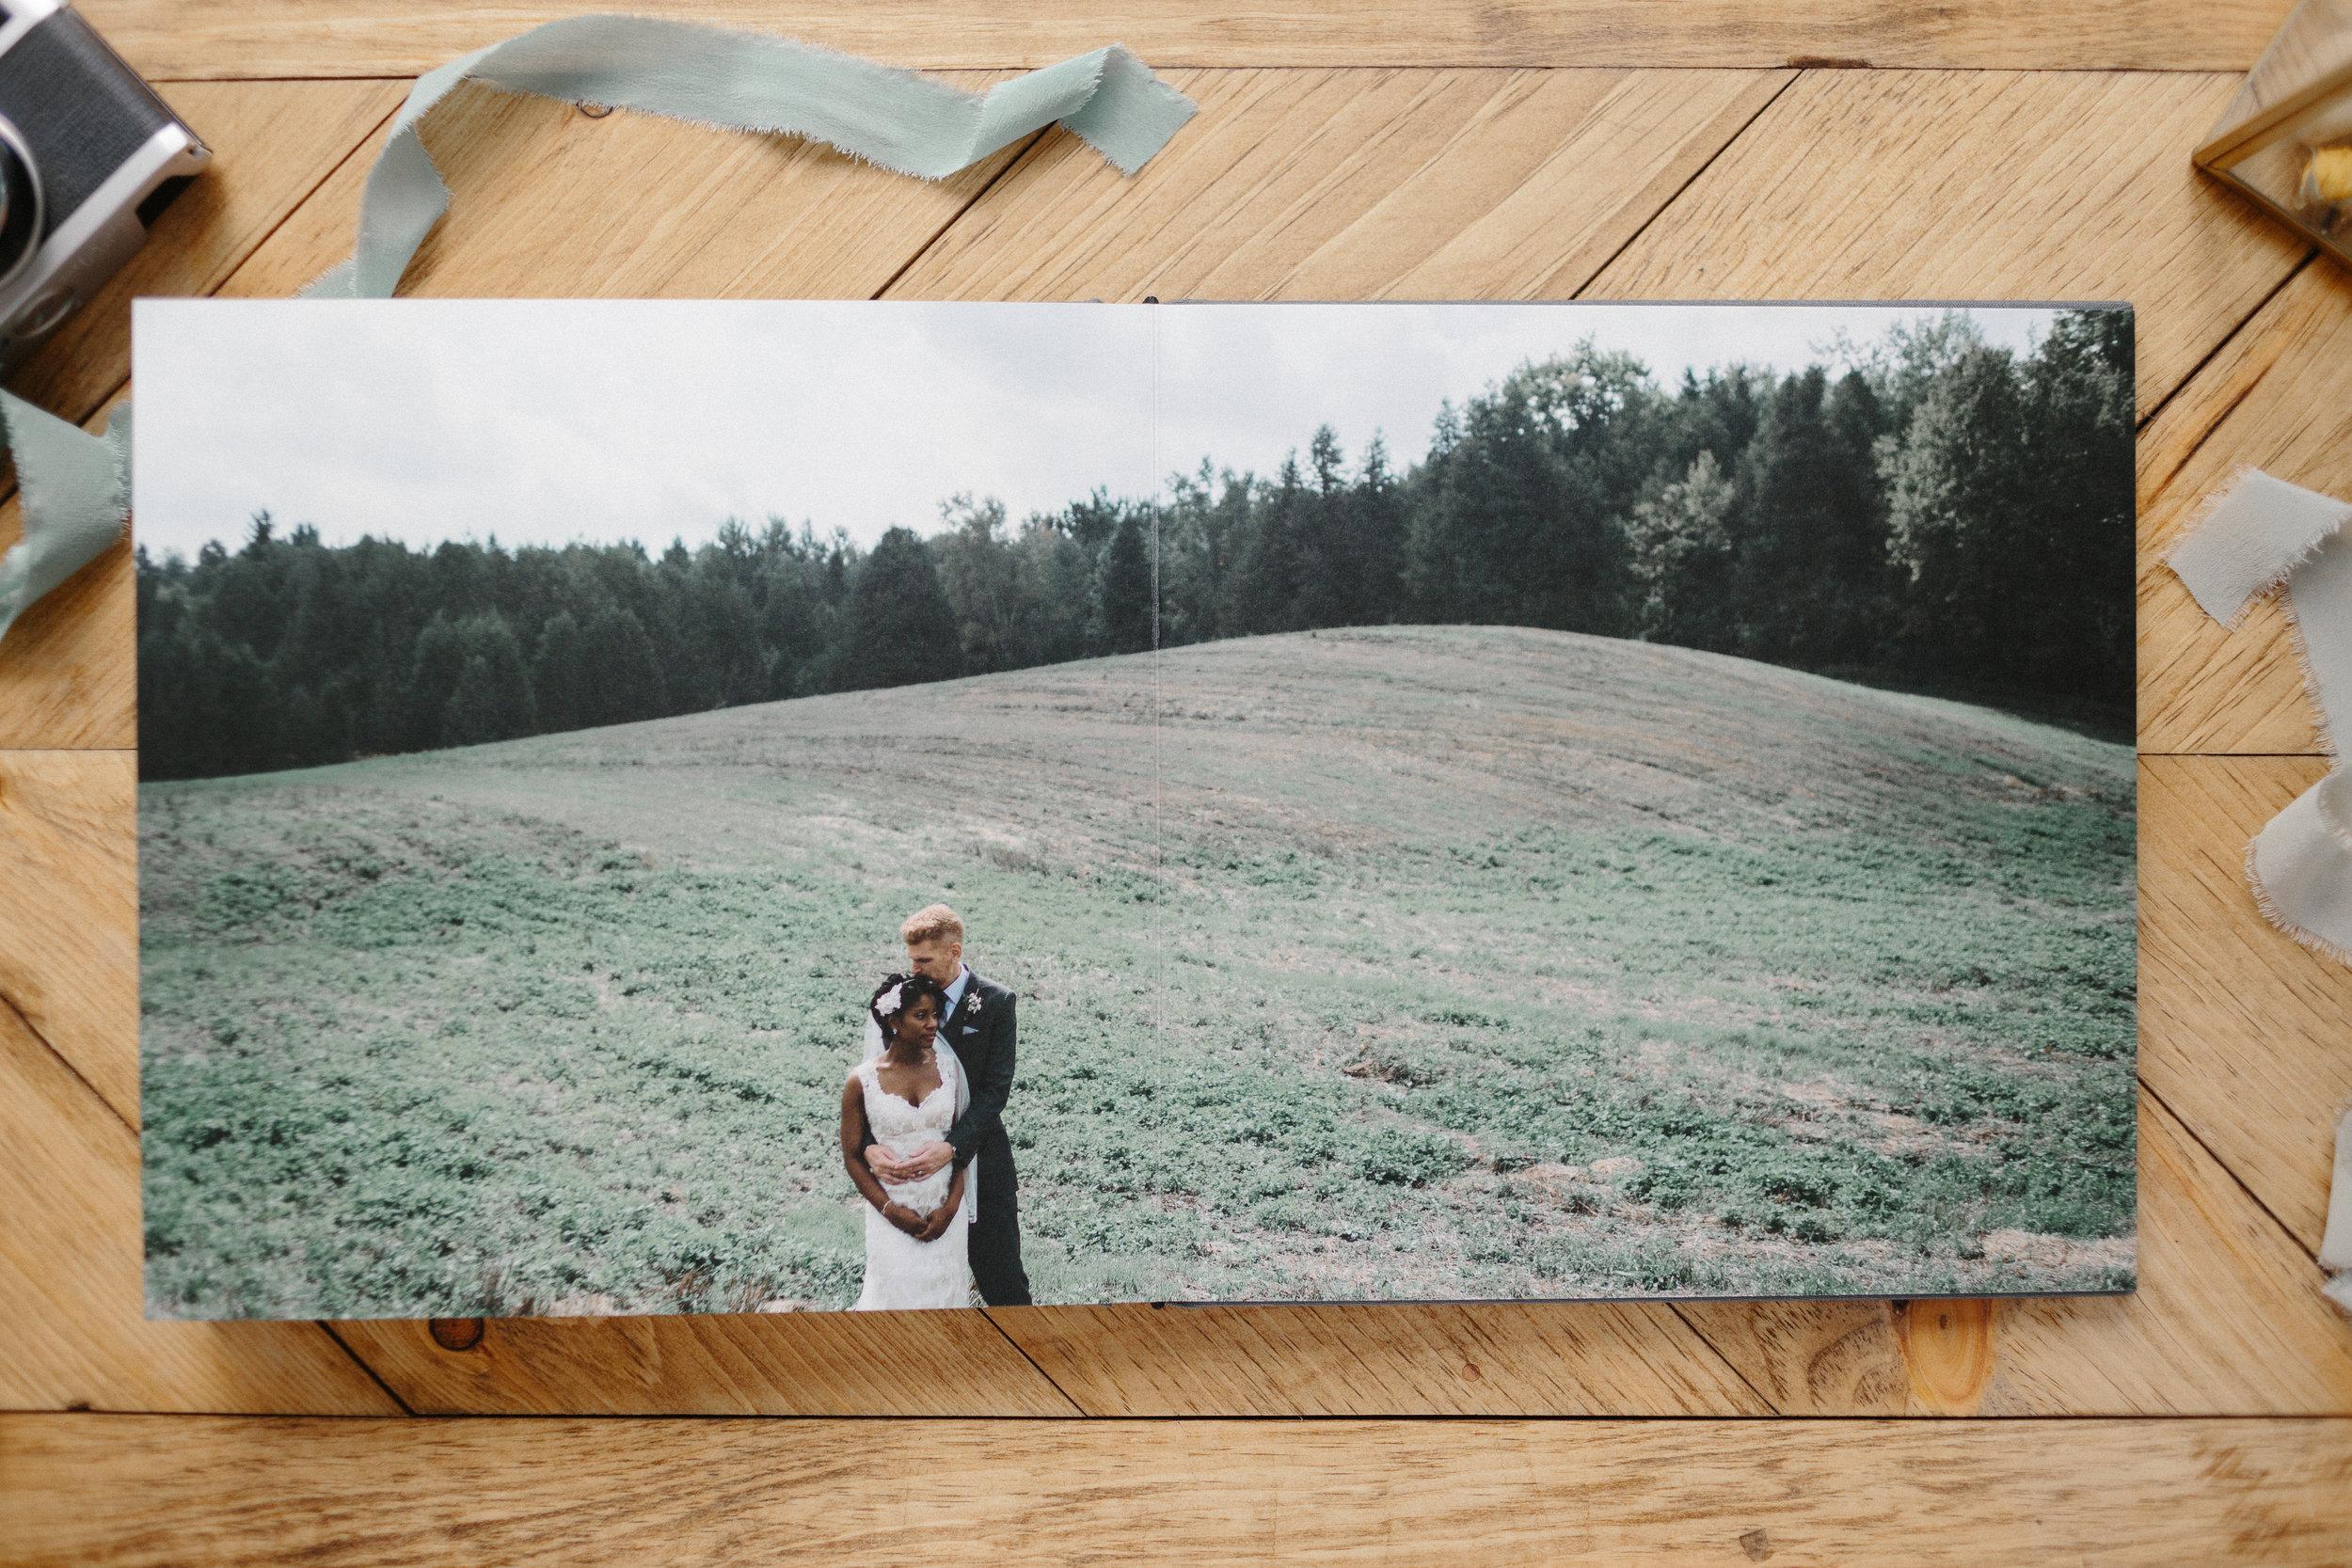 ryanne-hollies-photography-wedding-album-design-details-tono-and-co-artifact-uprising-74.jpg